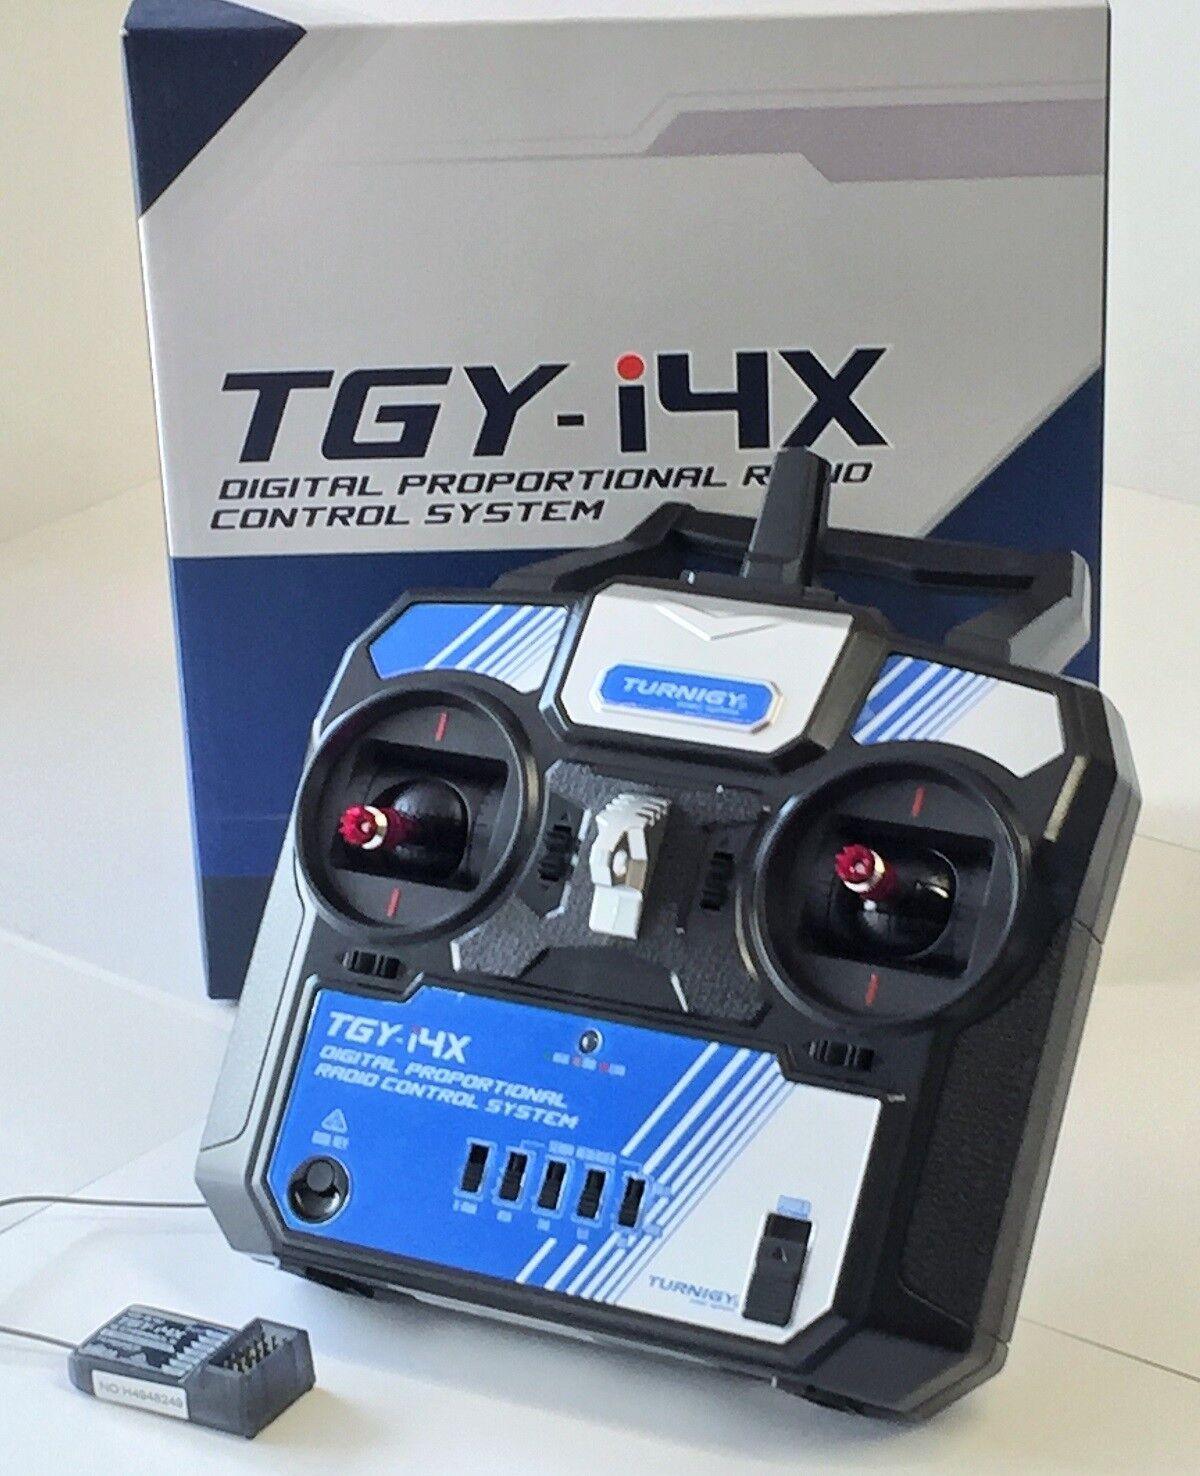 Turnigy TGY-i4X 4 CHANNEL TRANSMITTER 2.4Ghz IDEA FOR MODEL BOAT, CAR OR PLANE